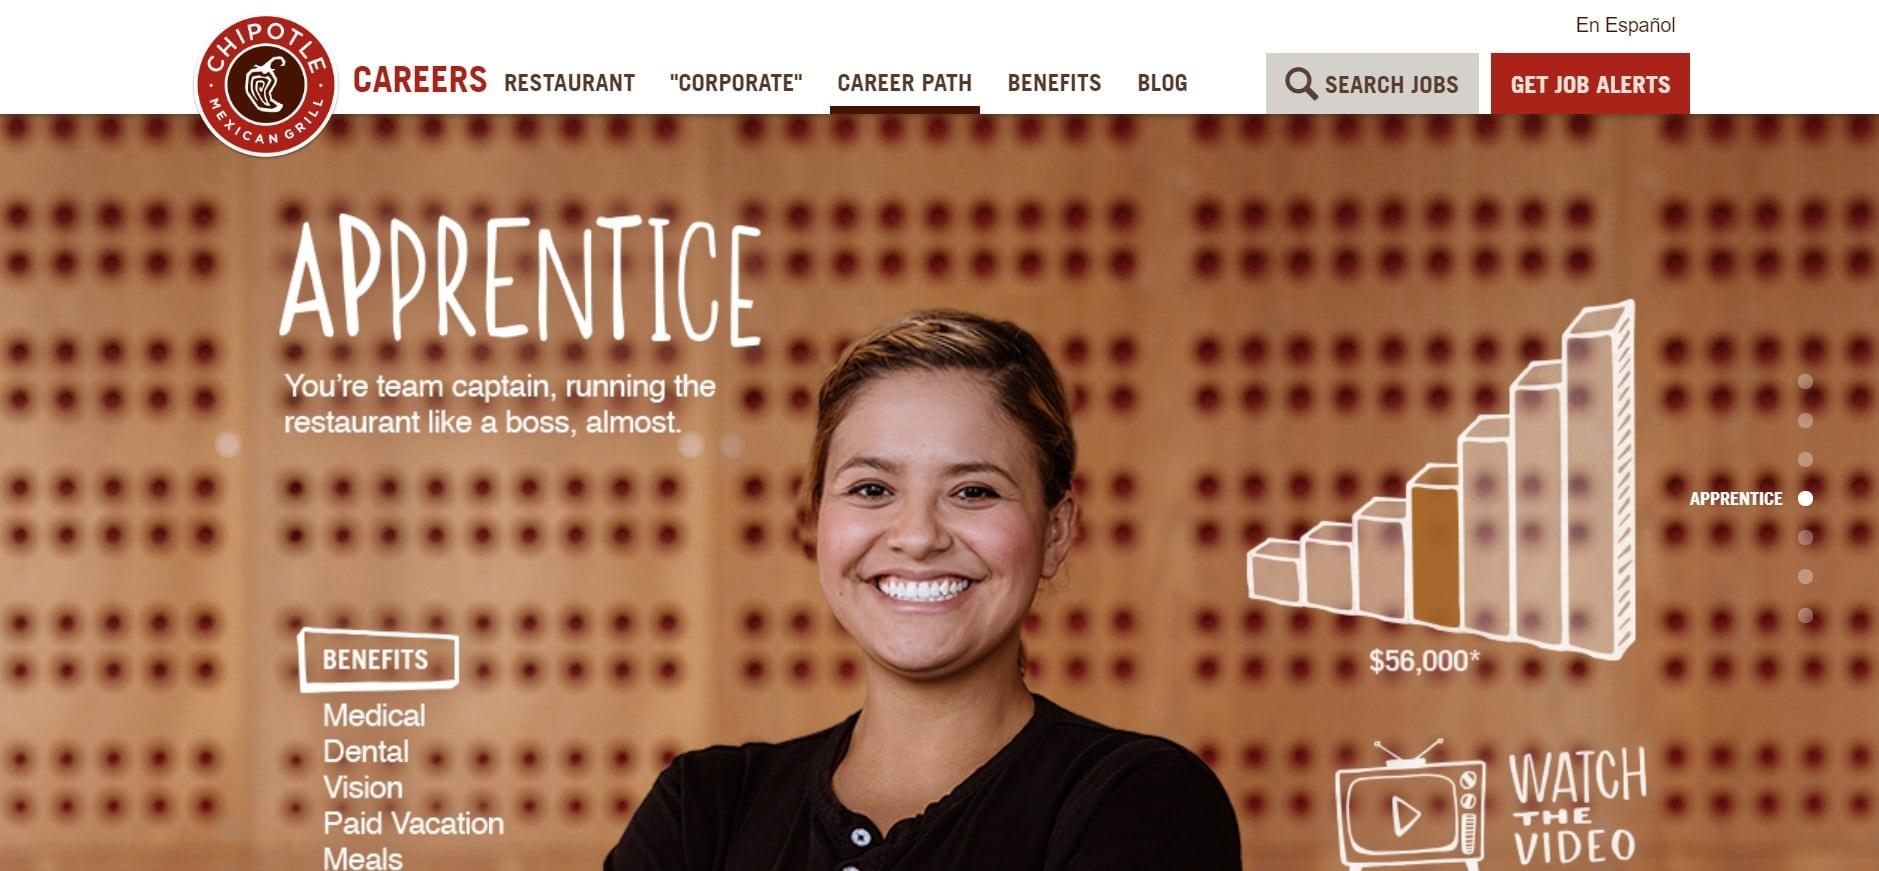 Die Karriere-Website Chipotle